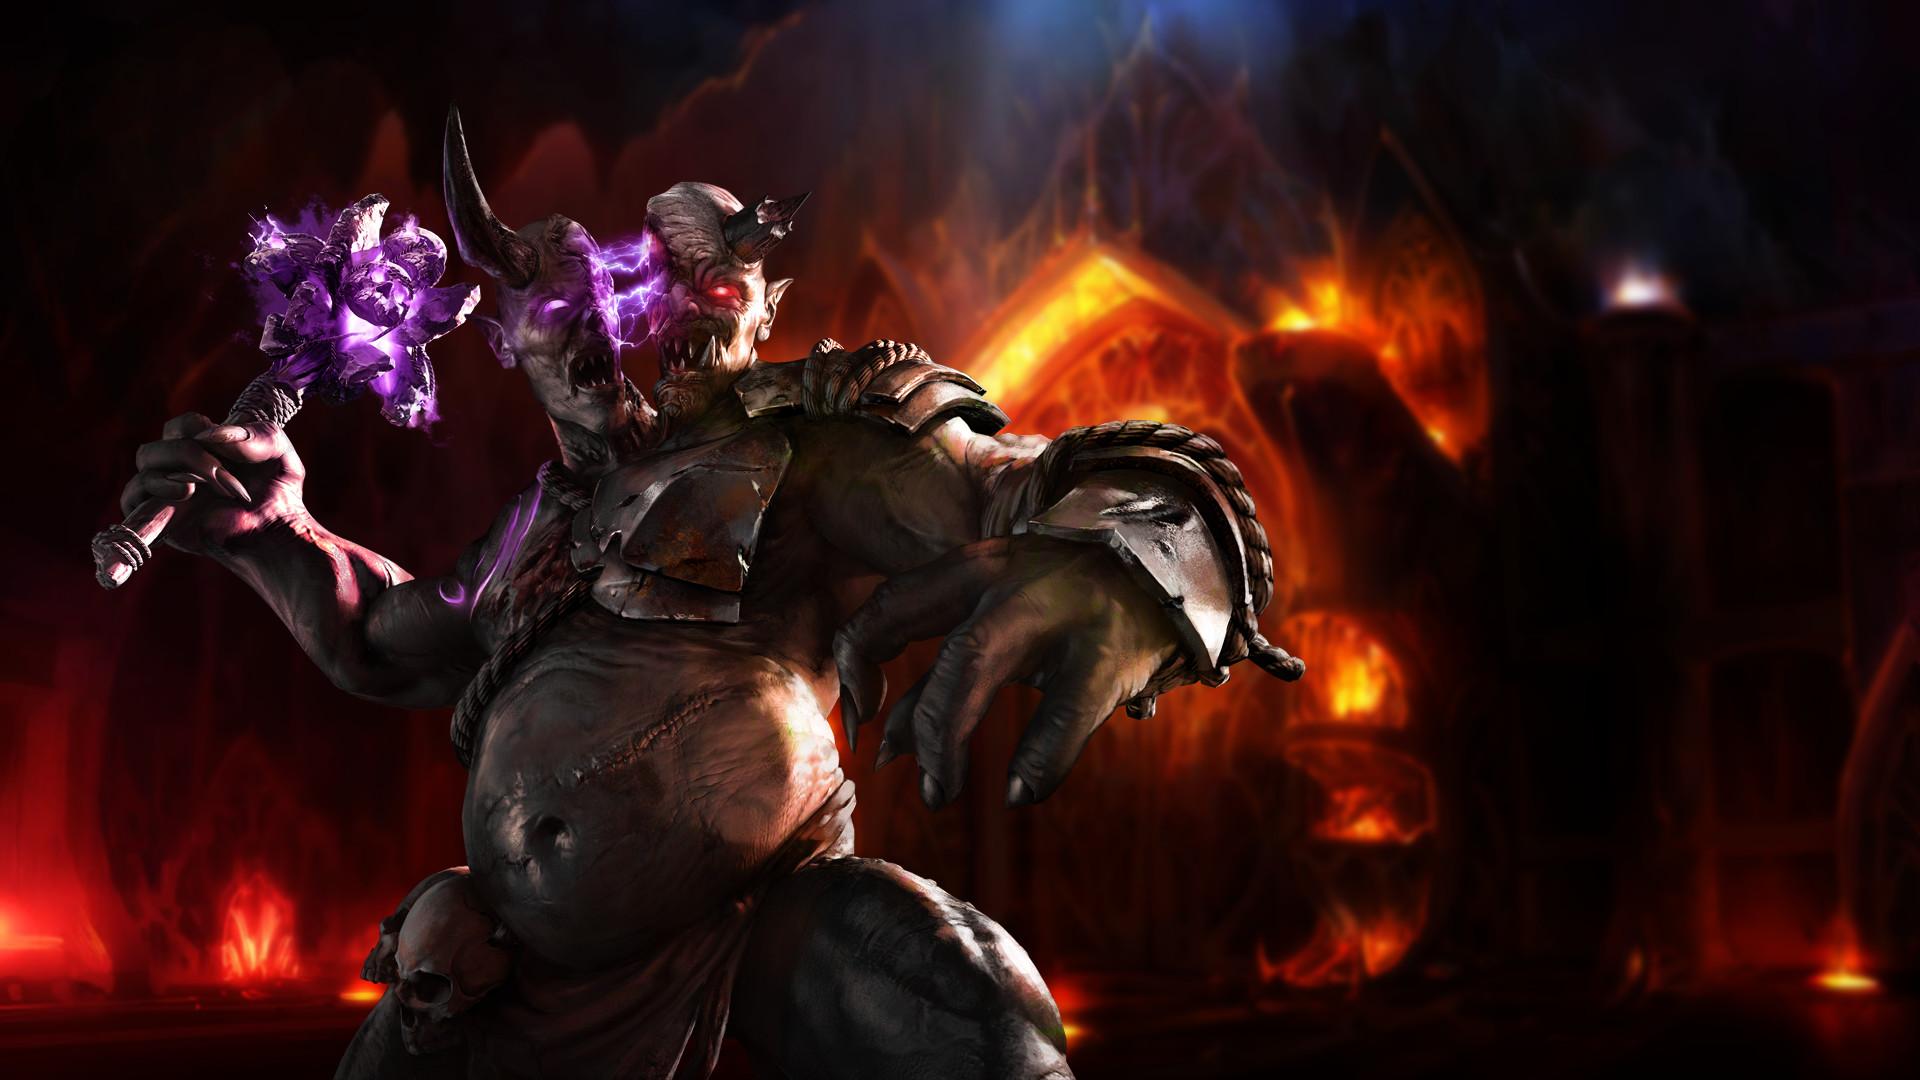 … Killer Instinct: Eyedol Wallpaper by Nekro-Lord